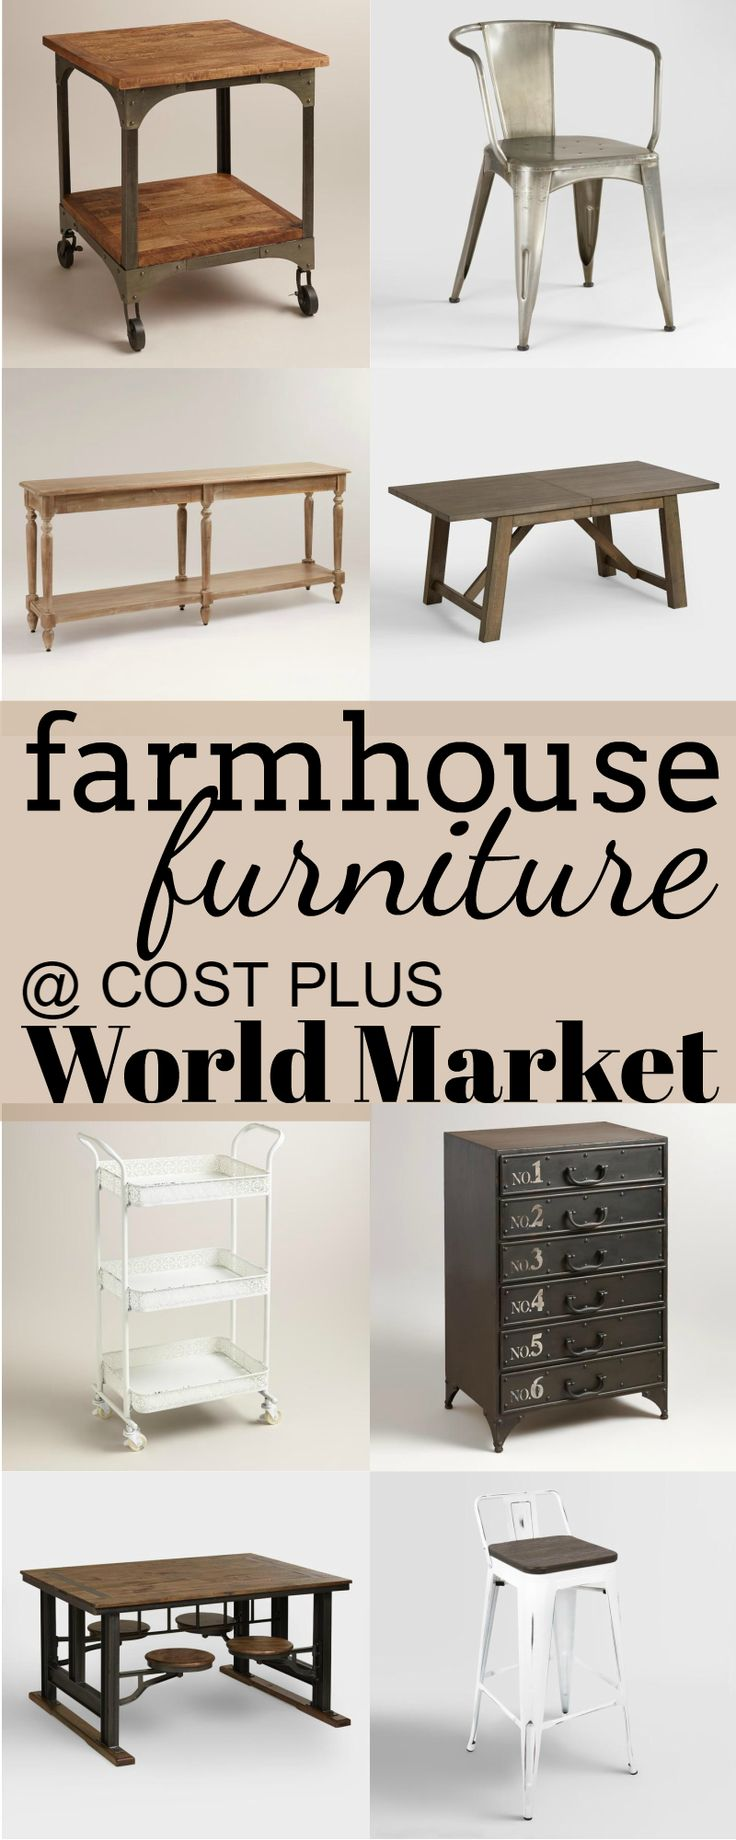 Farmhouse Furniture At Cost Plus World Market